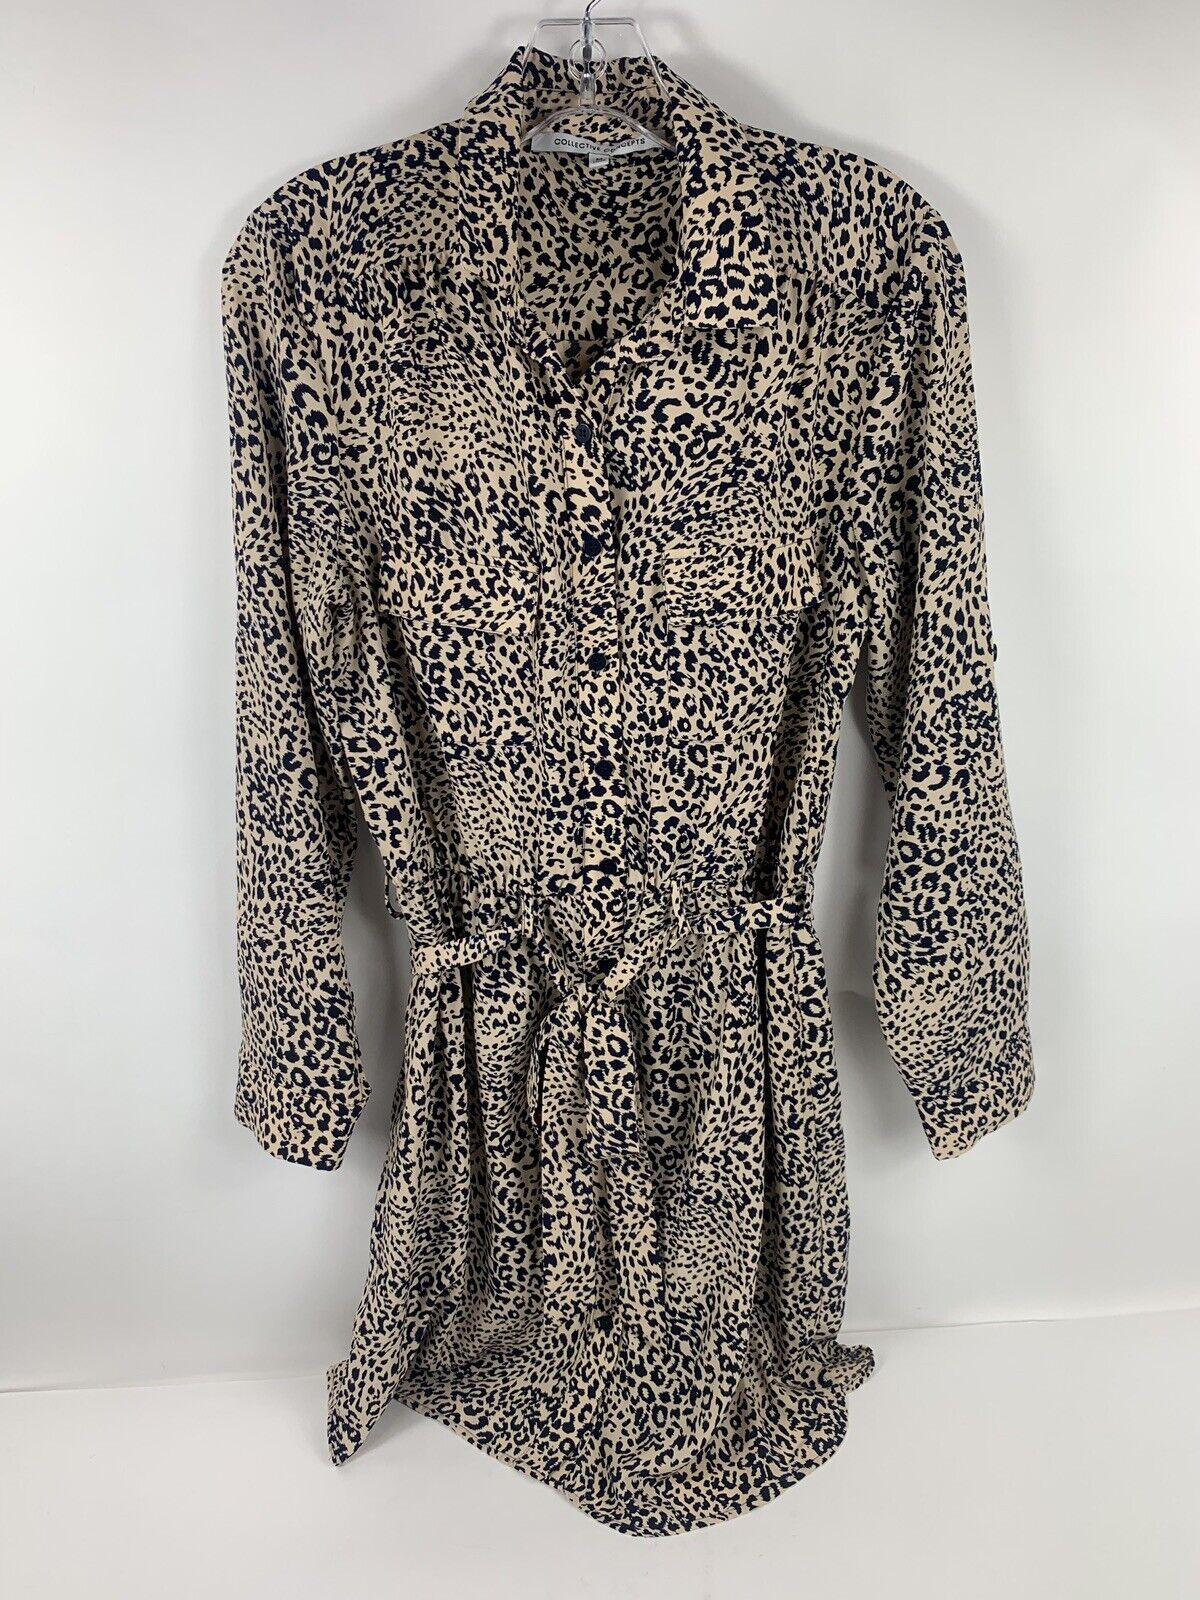 Collective Concepts 3 4 Sleeve Dress Leopard Print Shirt Button Down Medium bluee